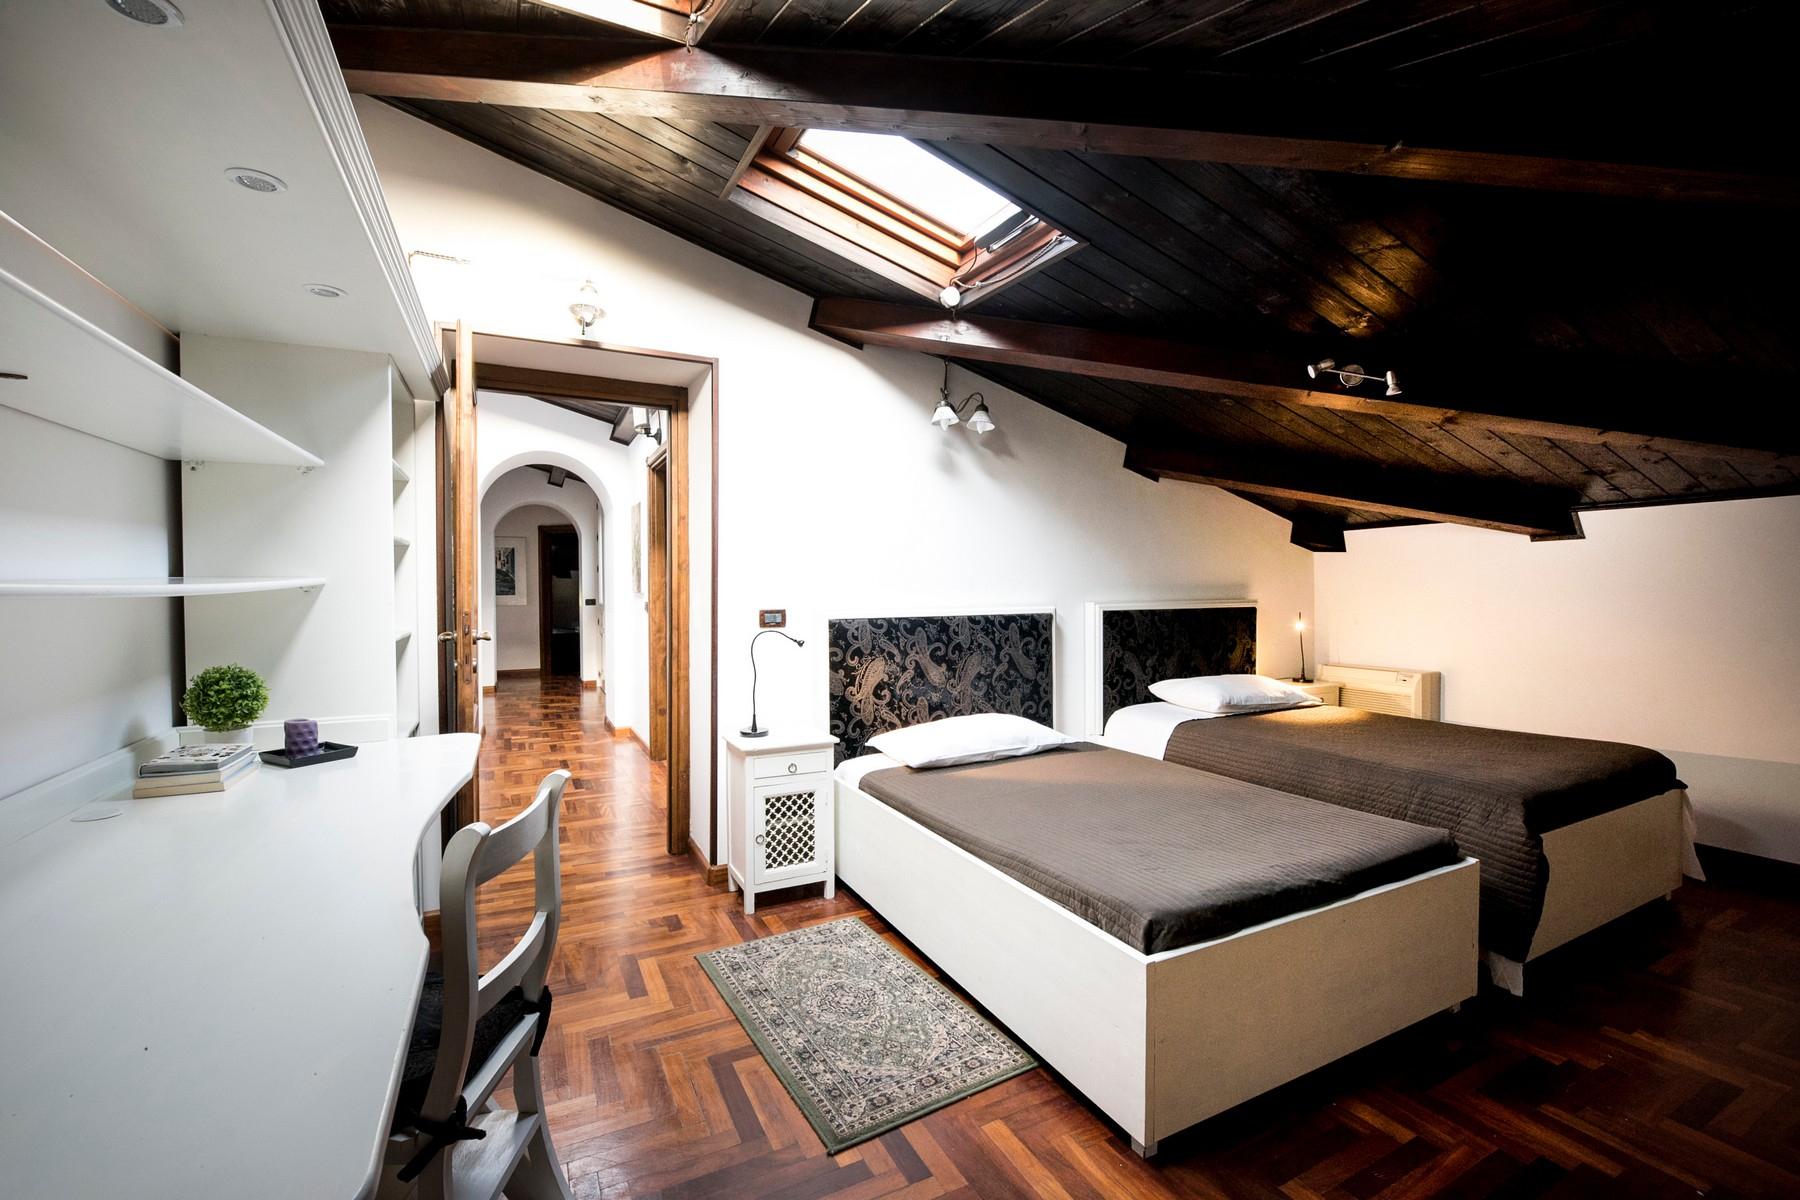 Casa indipendente in Vendita a Noto: 5 locali, 300 mq - Foto 22